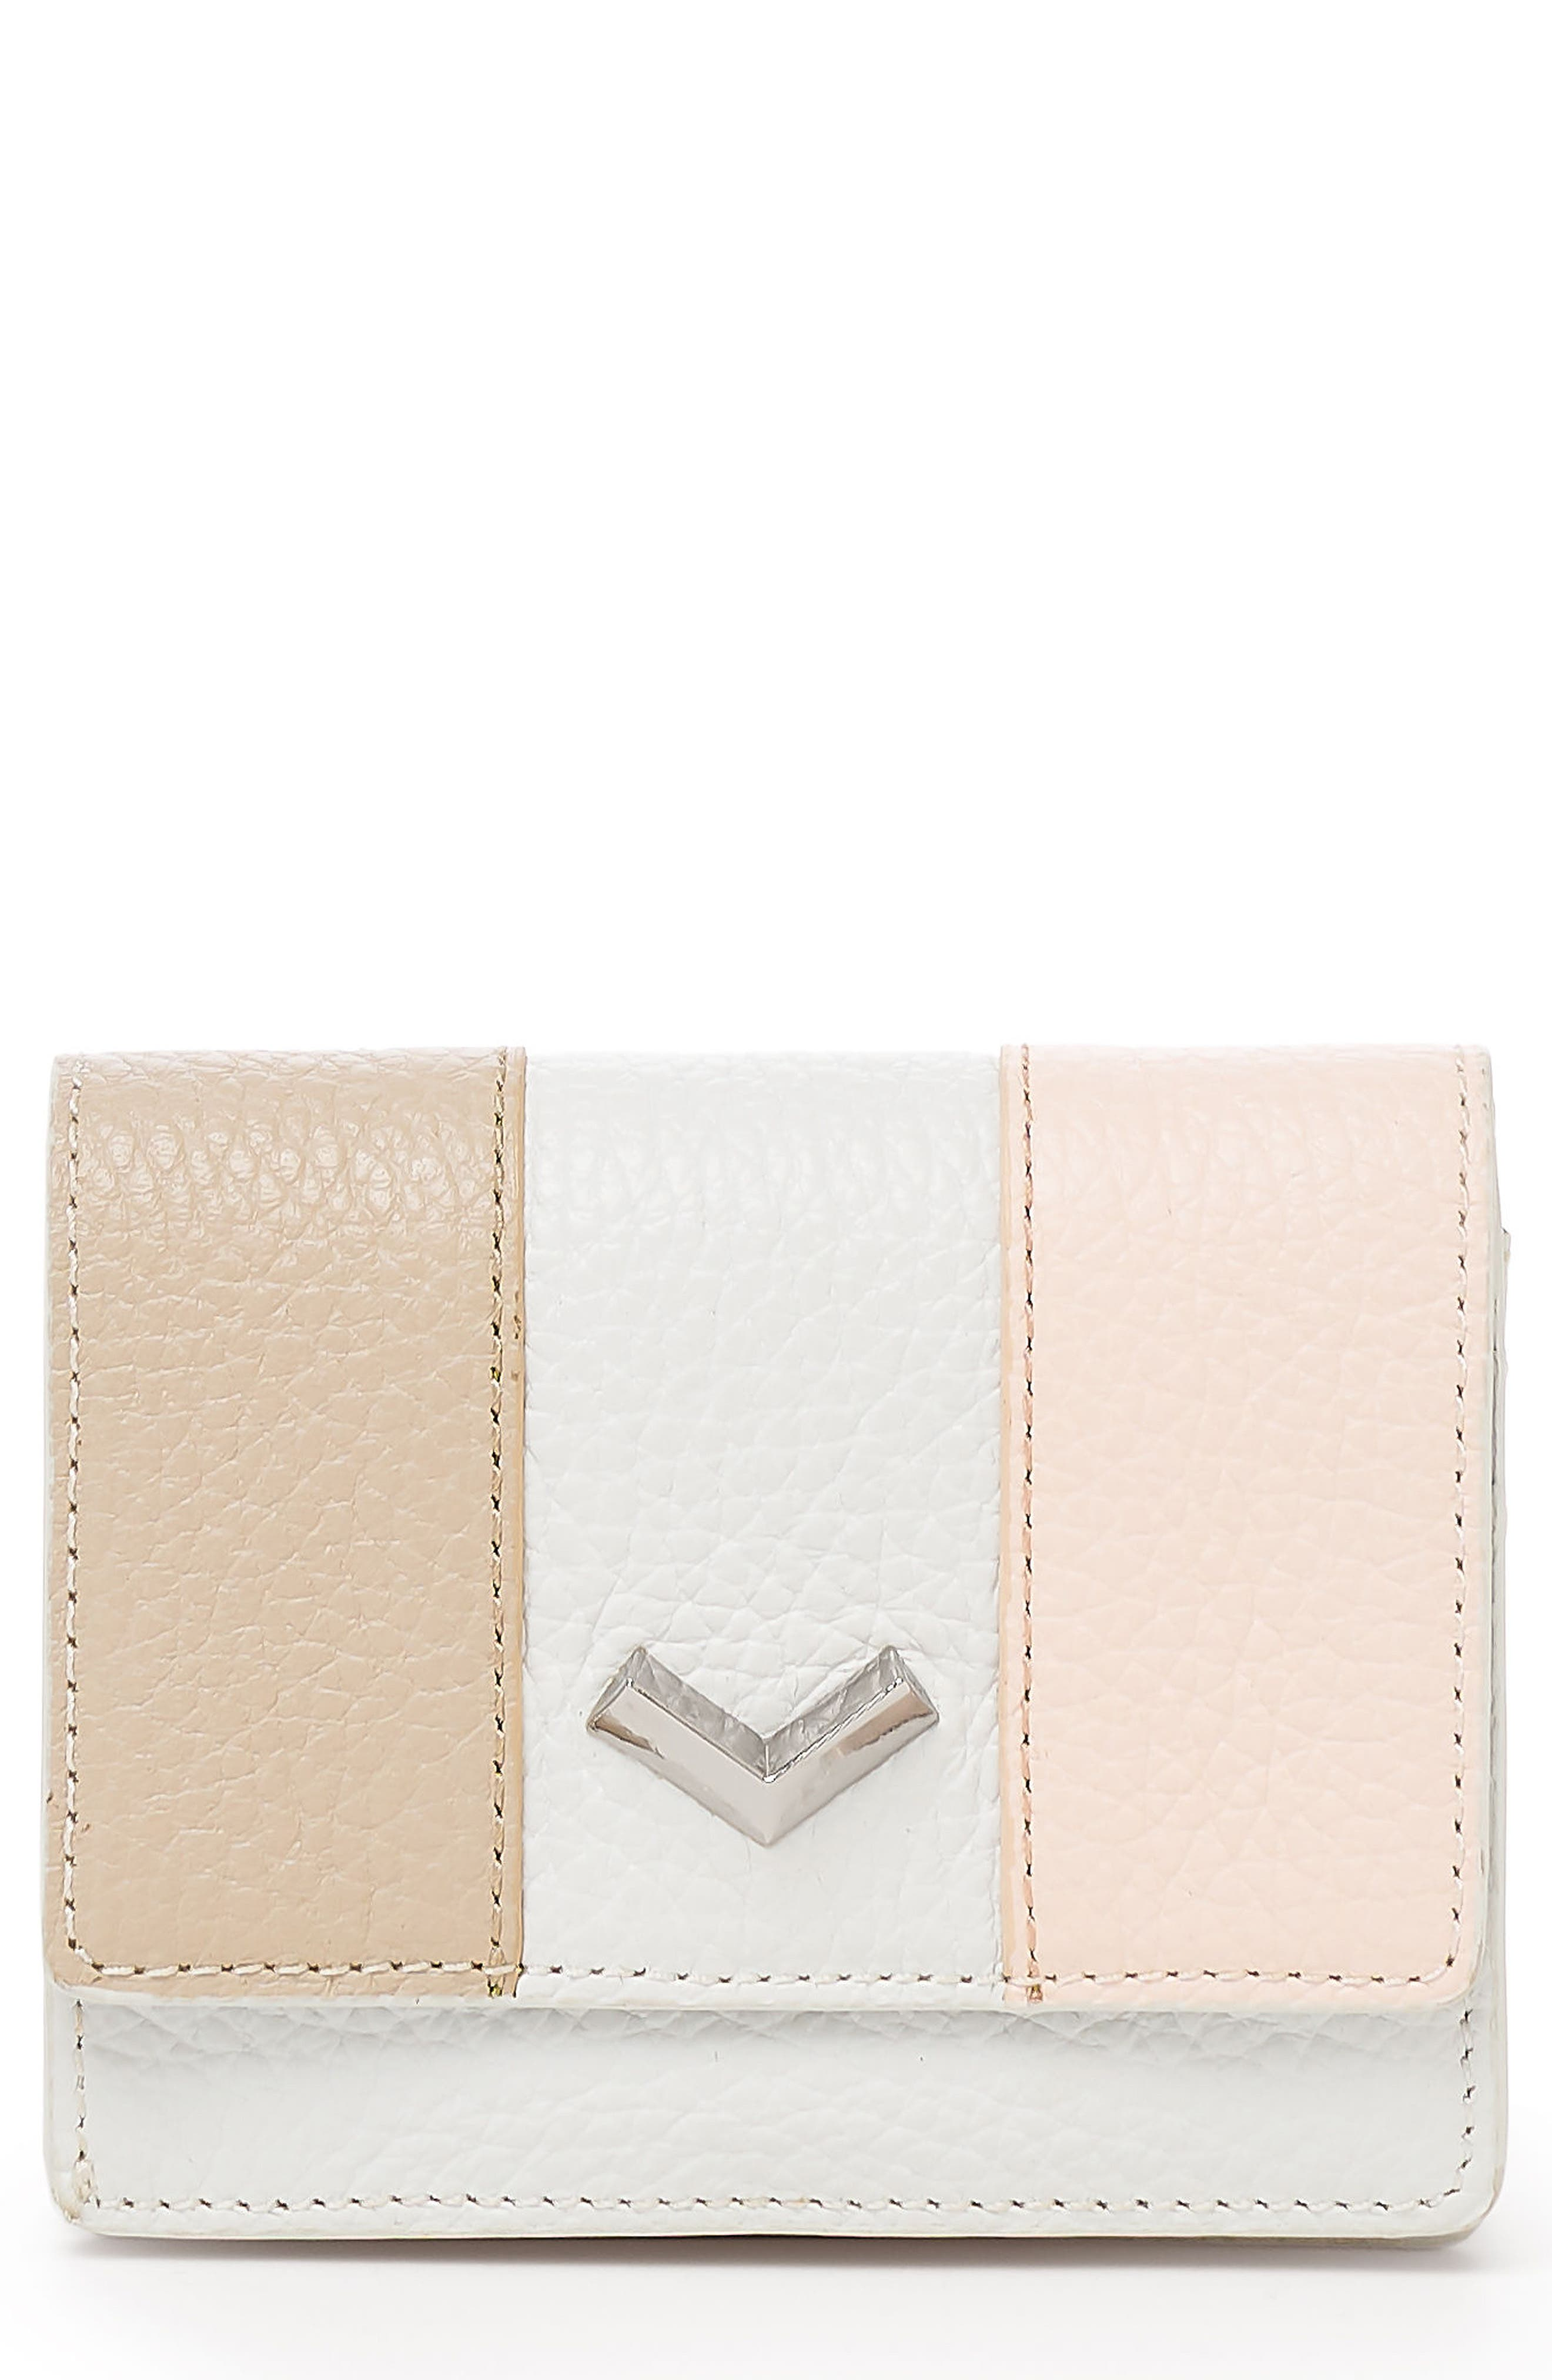 Alternate Image 1 Selected - Botkier Soho Mini Leather Wallet